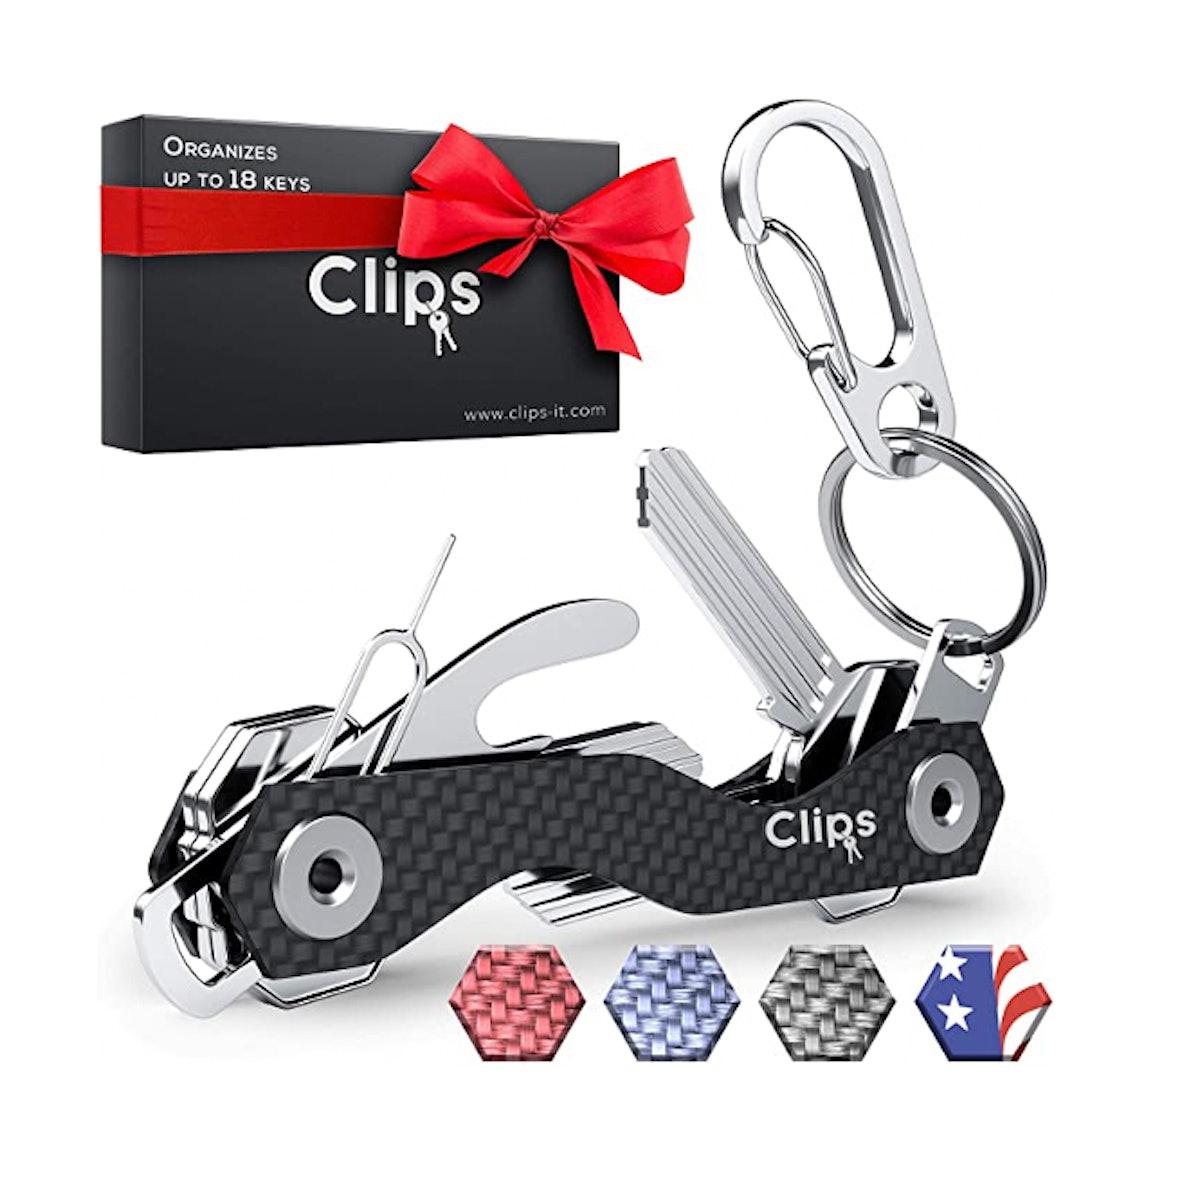 Clips Smart Compact Key Organizer